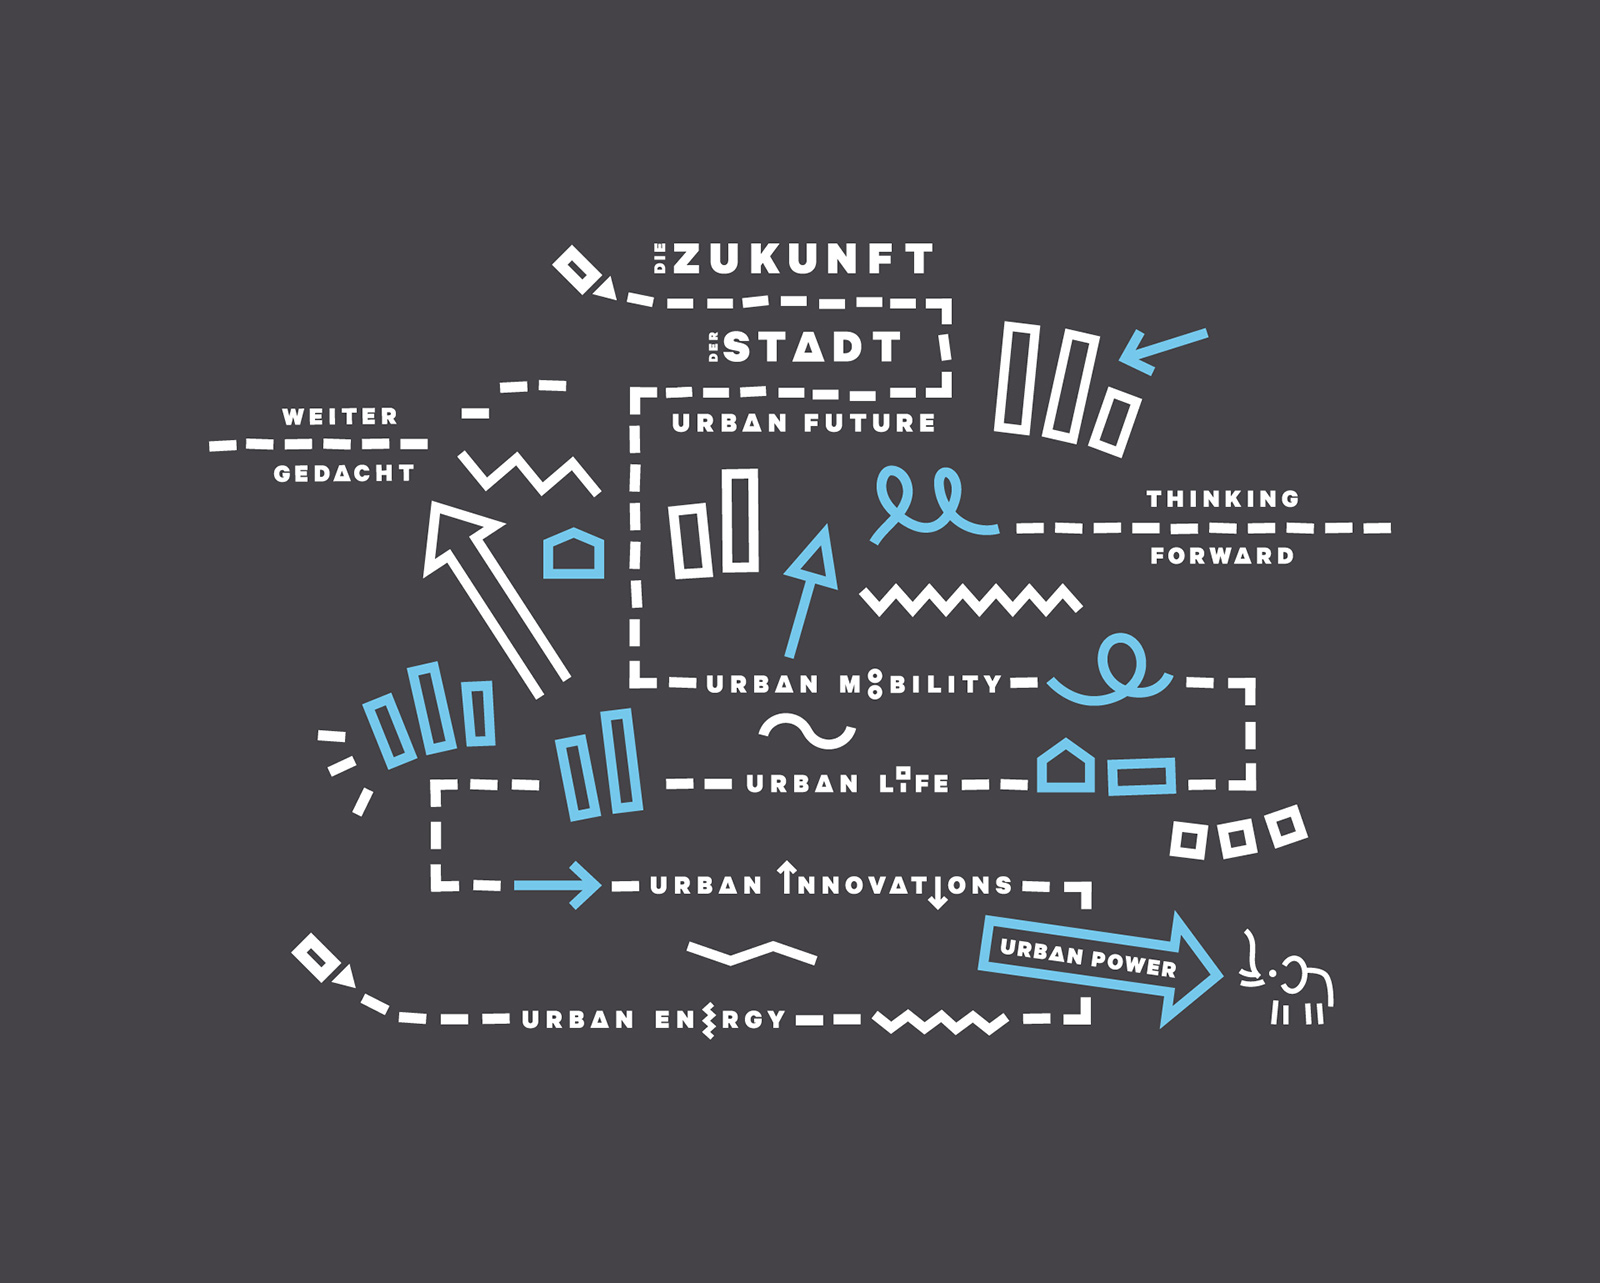 07_urbanfuture_illu_flat_web.jpg